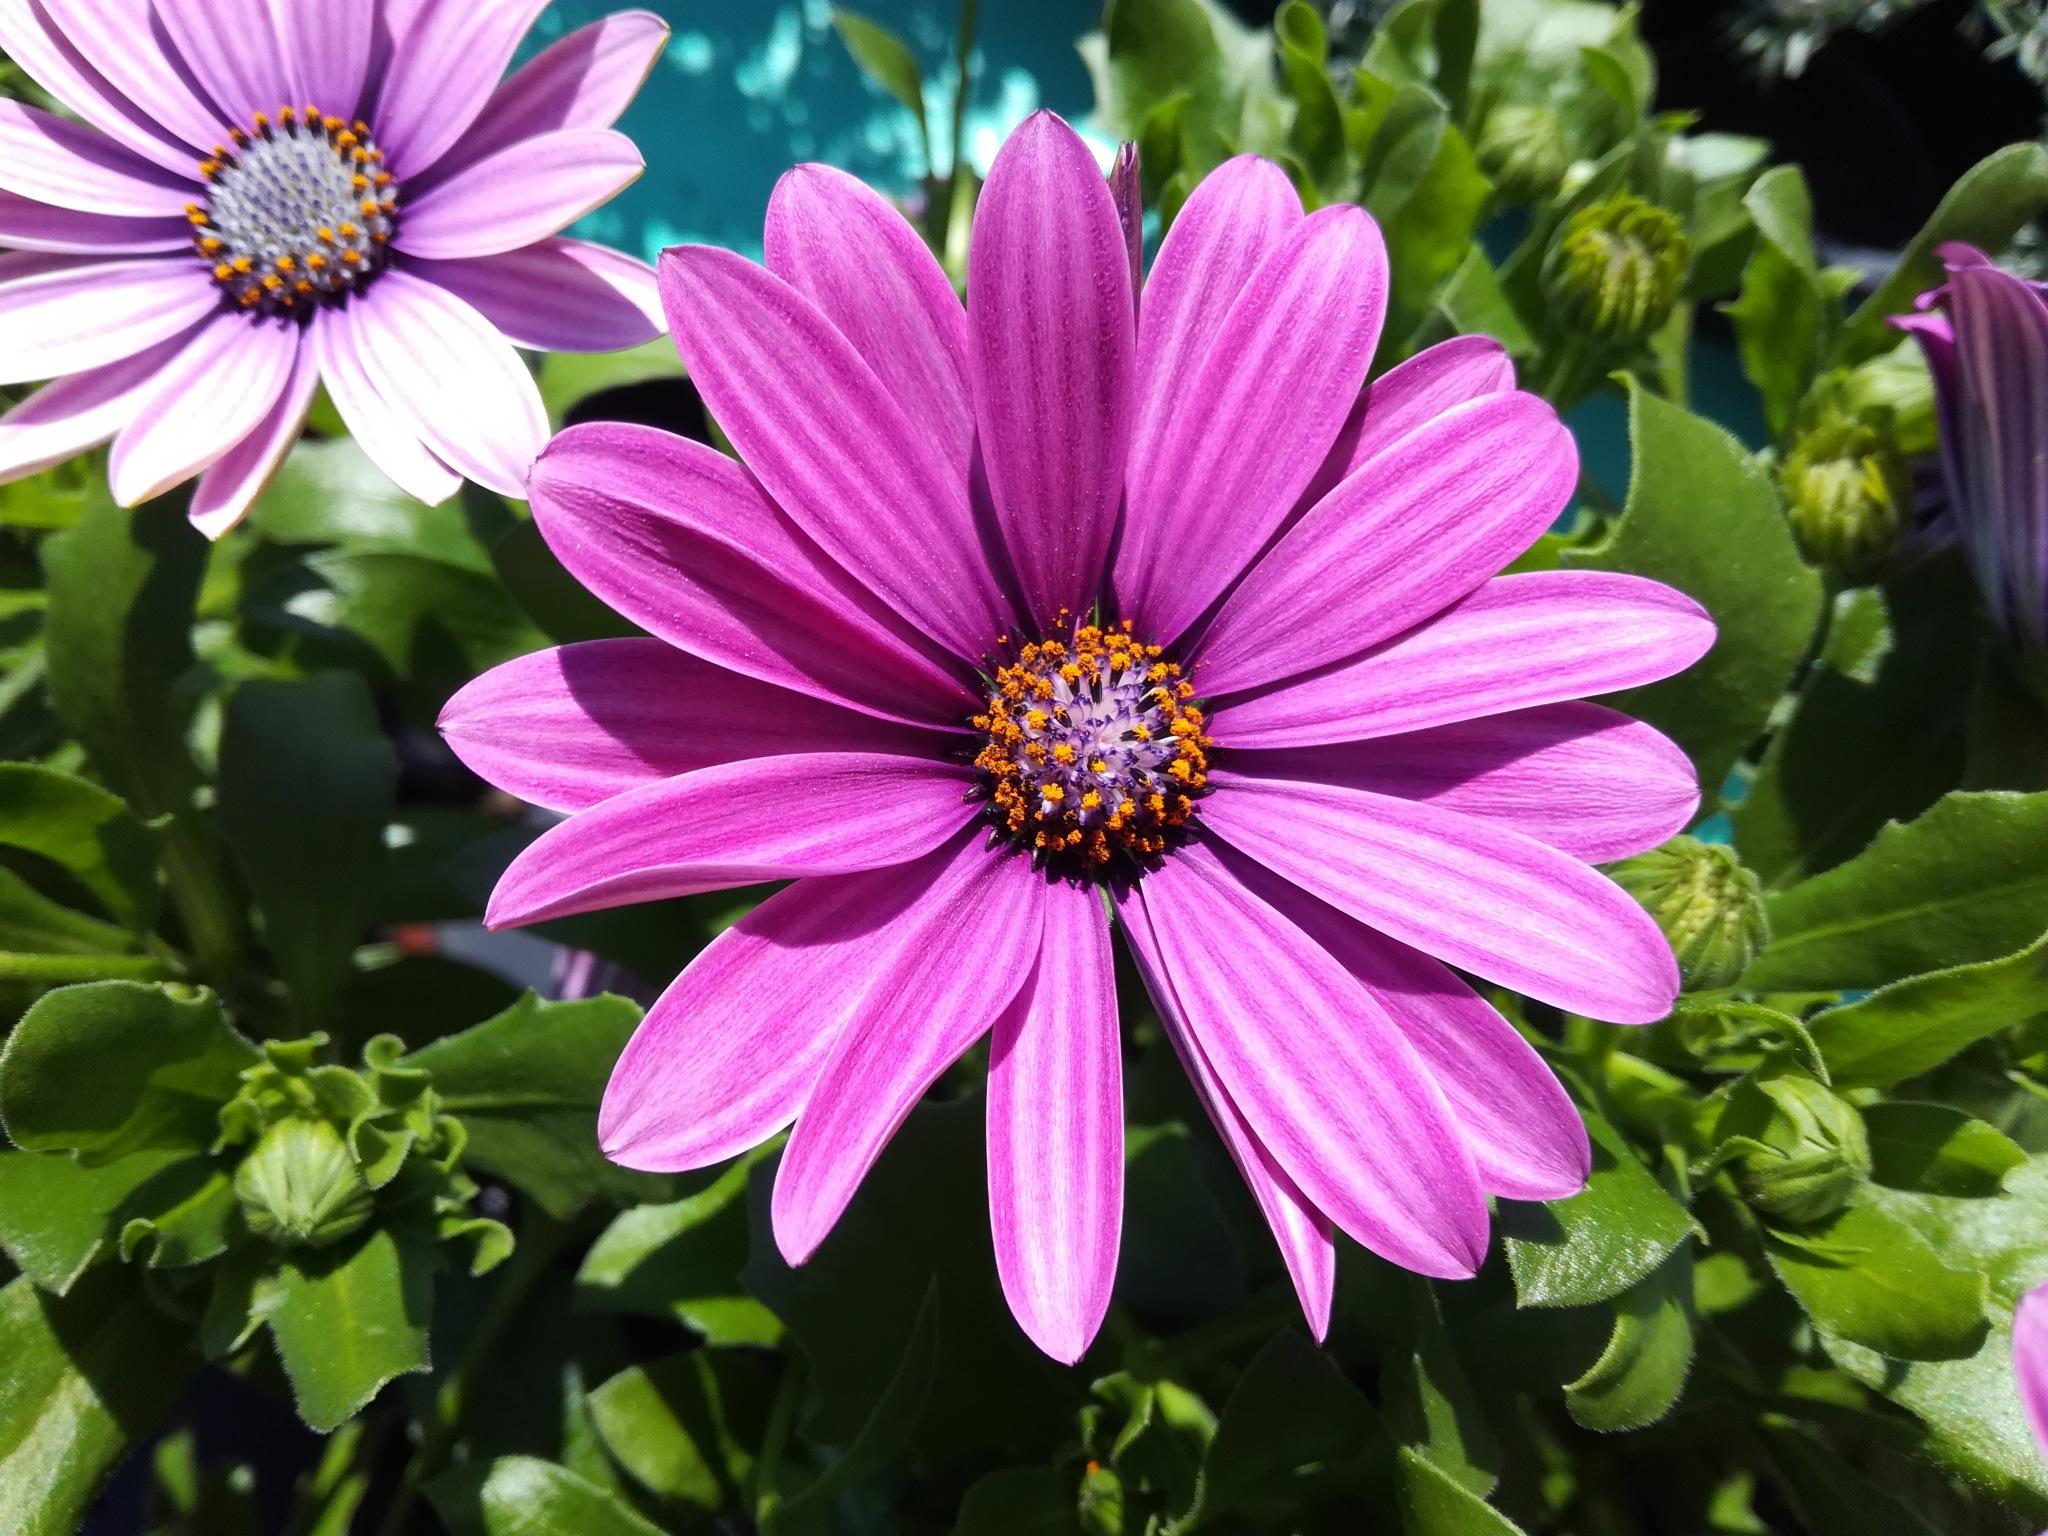 Purple flowers by uzkuraitiene62